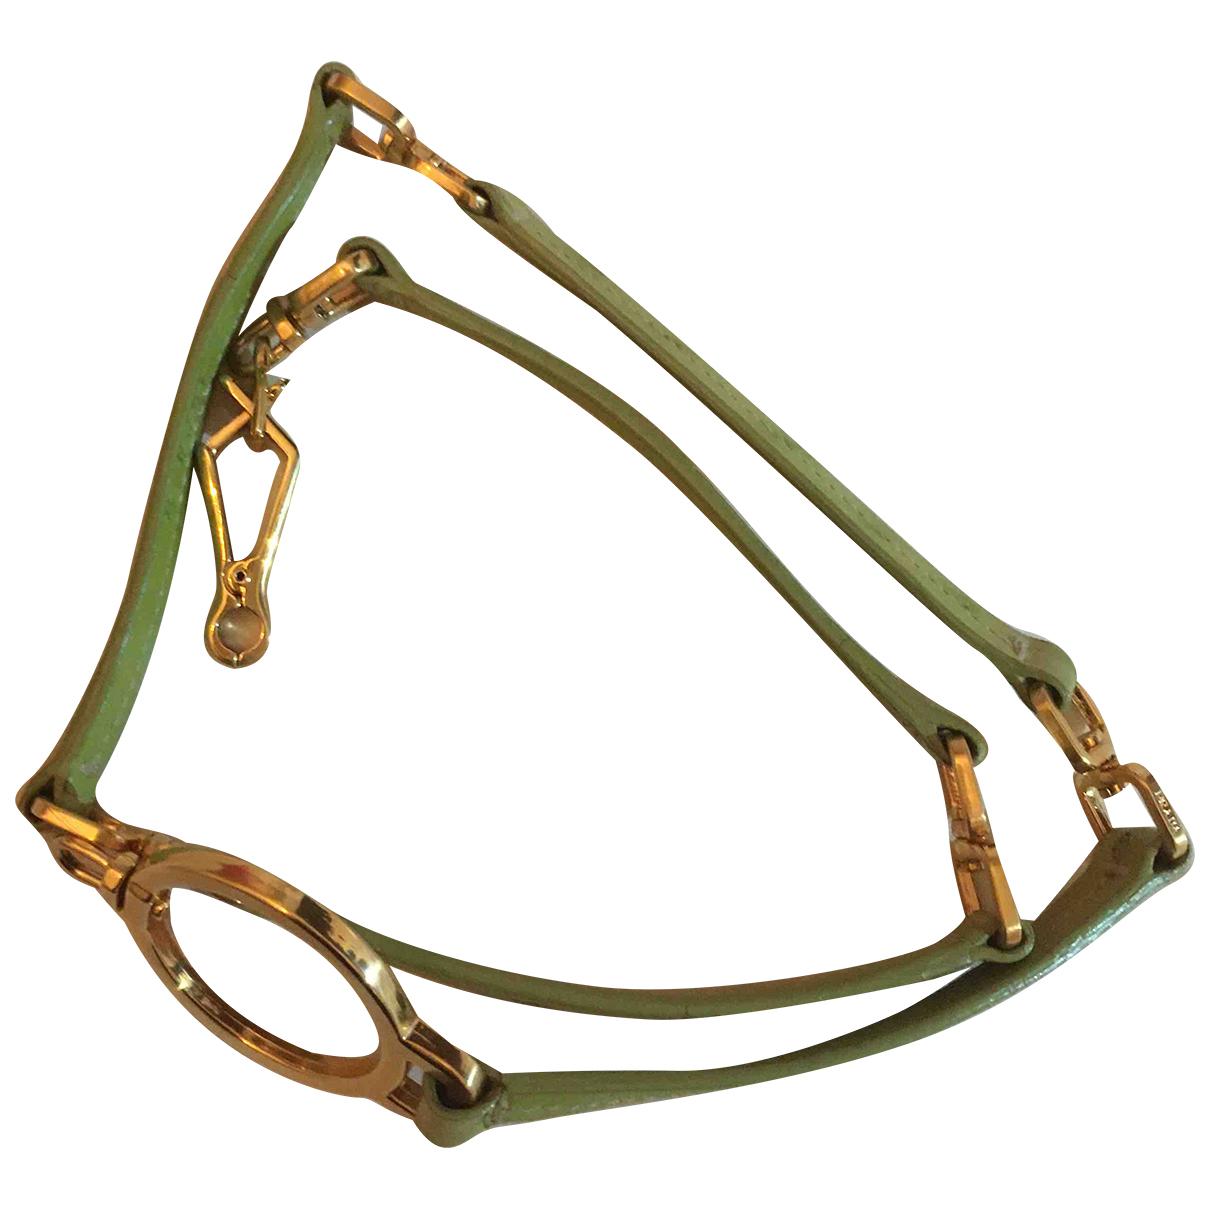 Prada N Green Ostrich belt for Women 75 cm